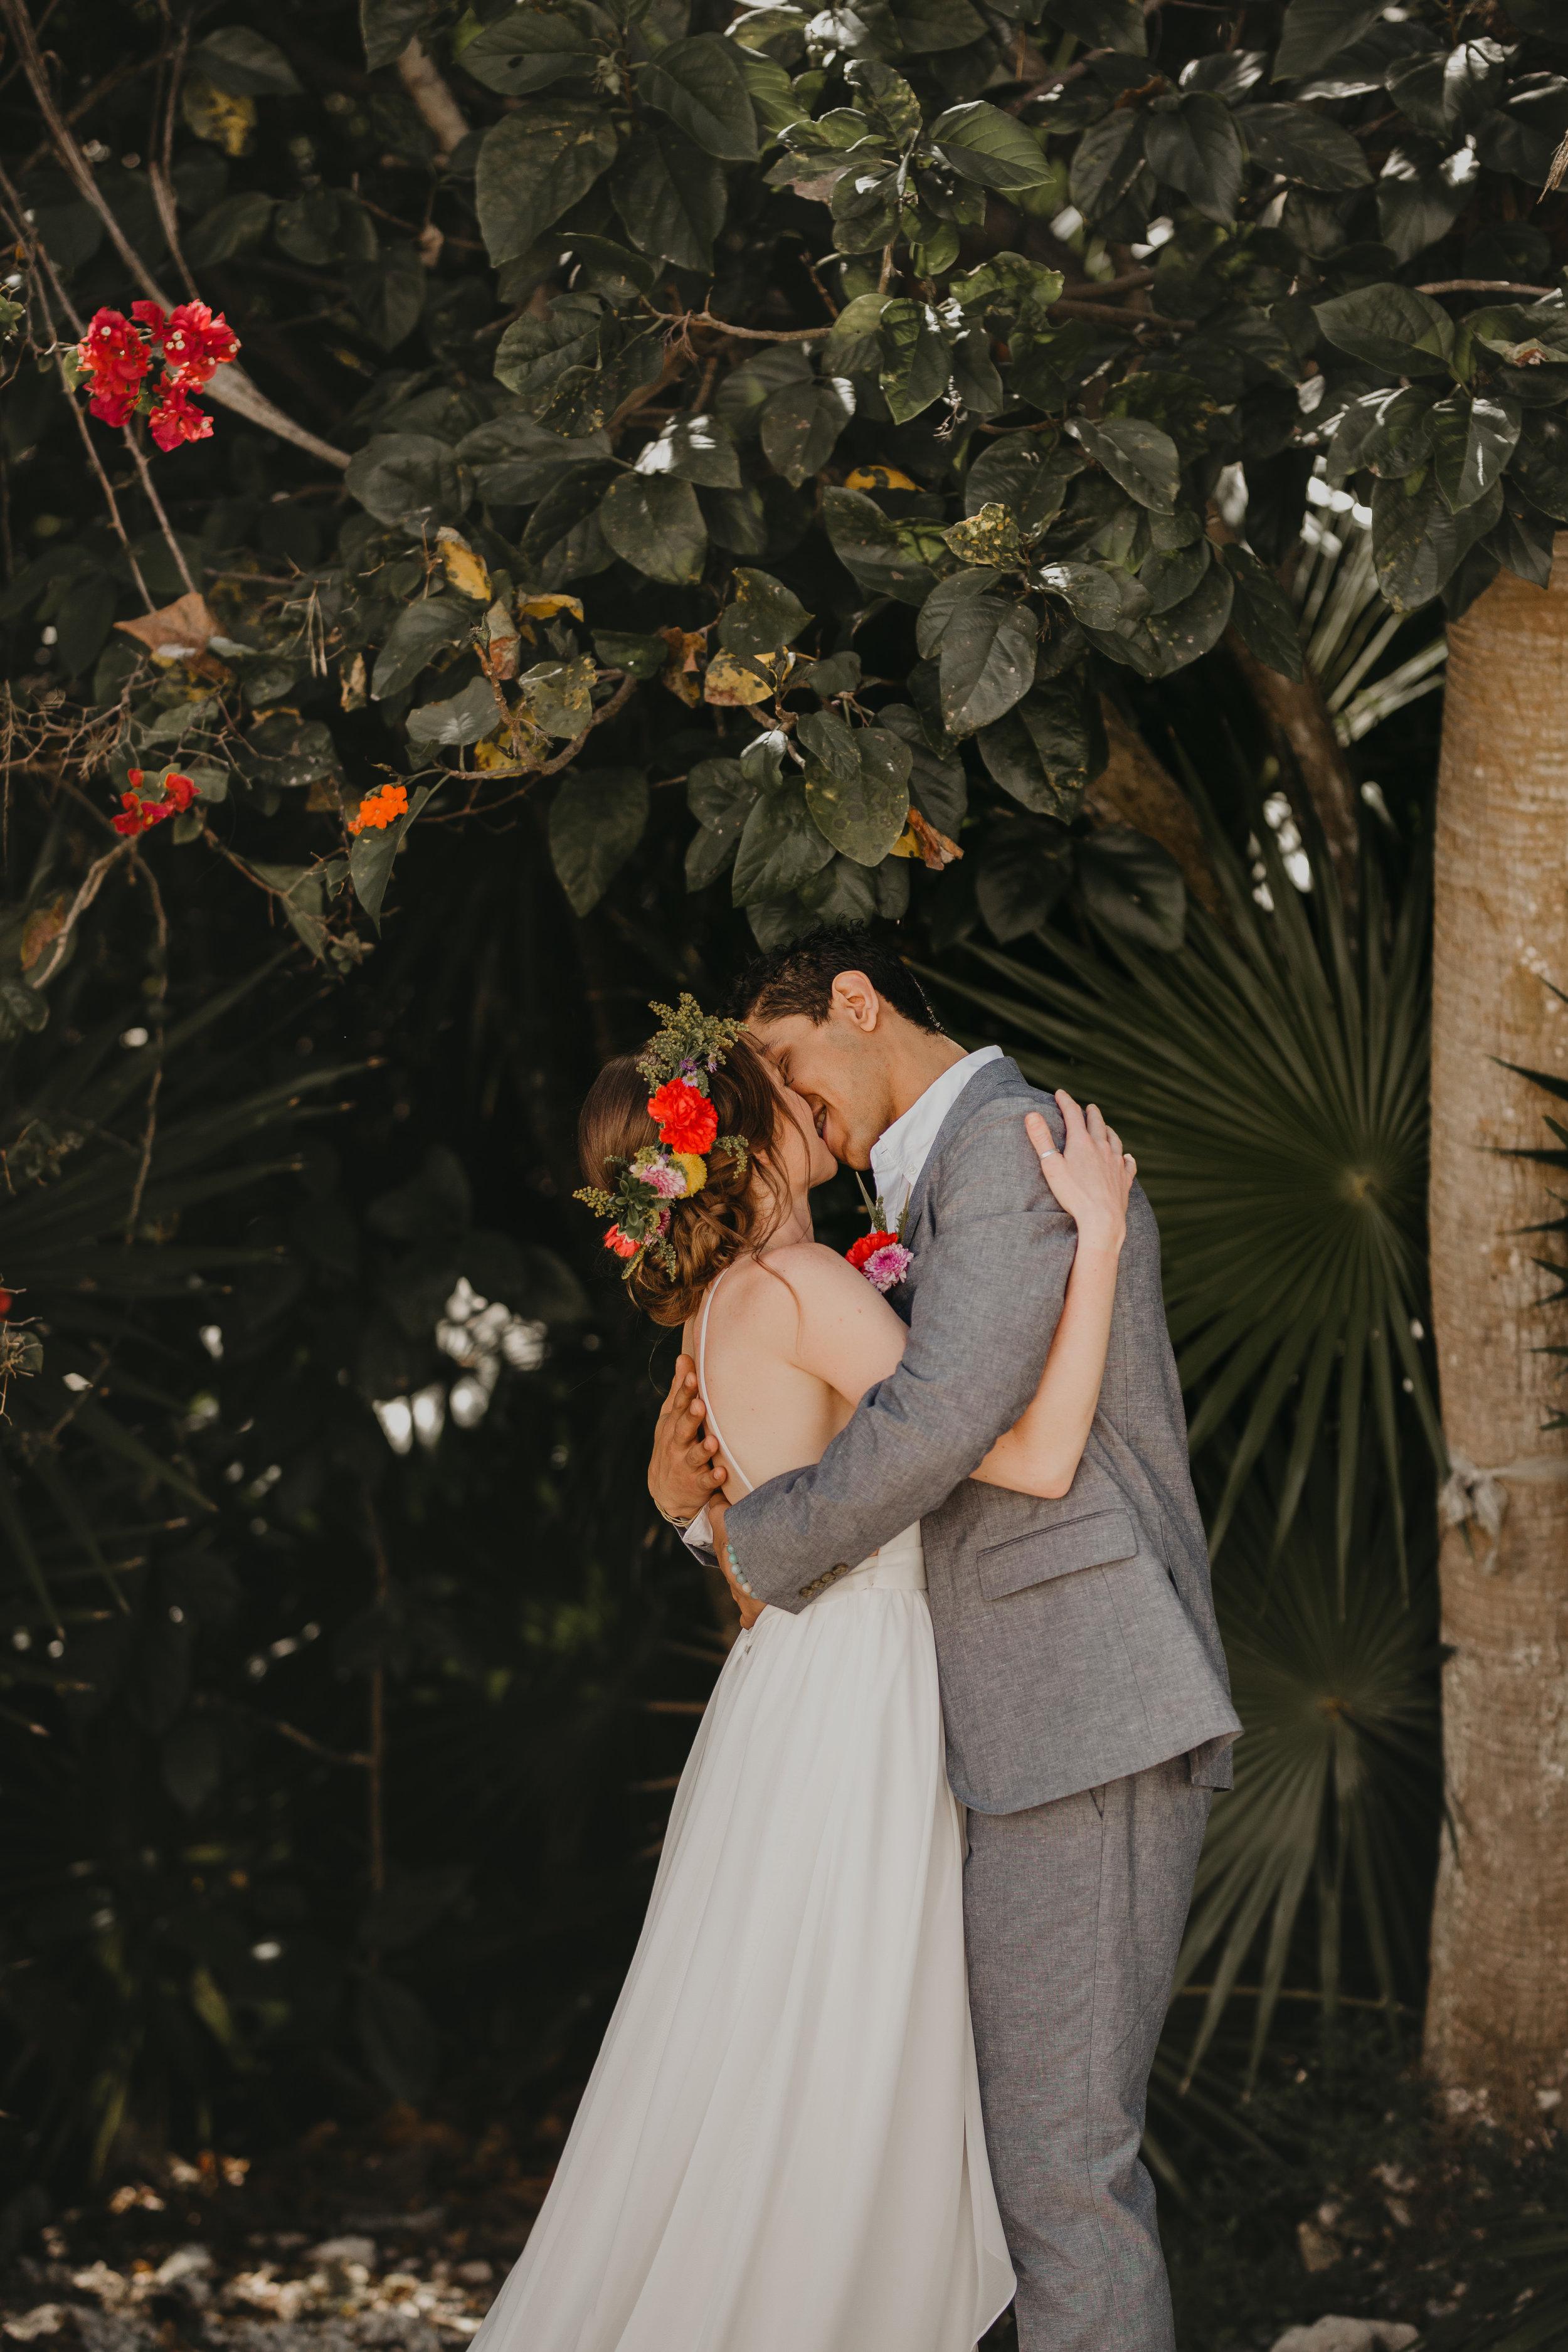 Nicole-Daacke-Photography-beachfront-akumal-destionation-wedding-tulum-mexico-elopement-photographer-destination-wedding-inspiration-sunset-champagne-pop-boho-bride-ocean-tropical-bohemian-tulum-wedding-photos-116.jpg